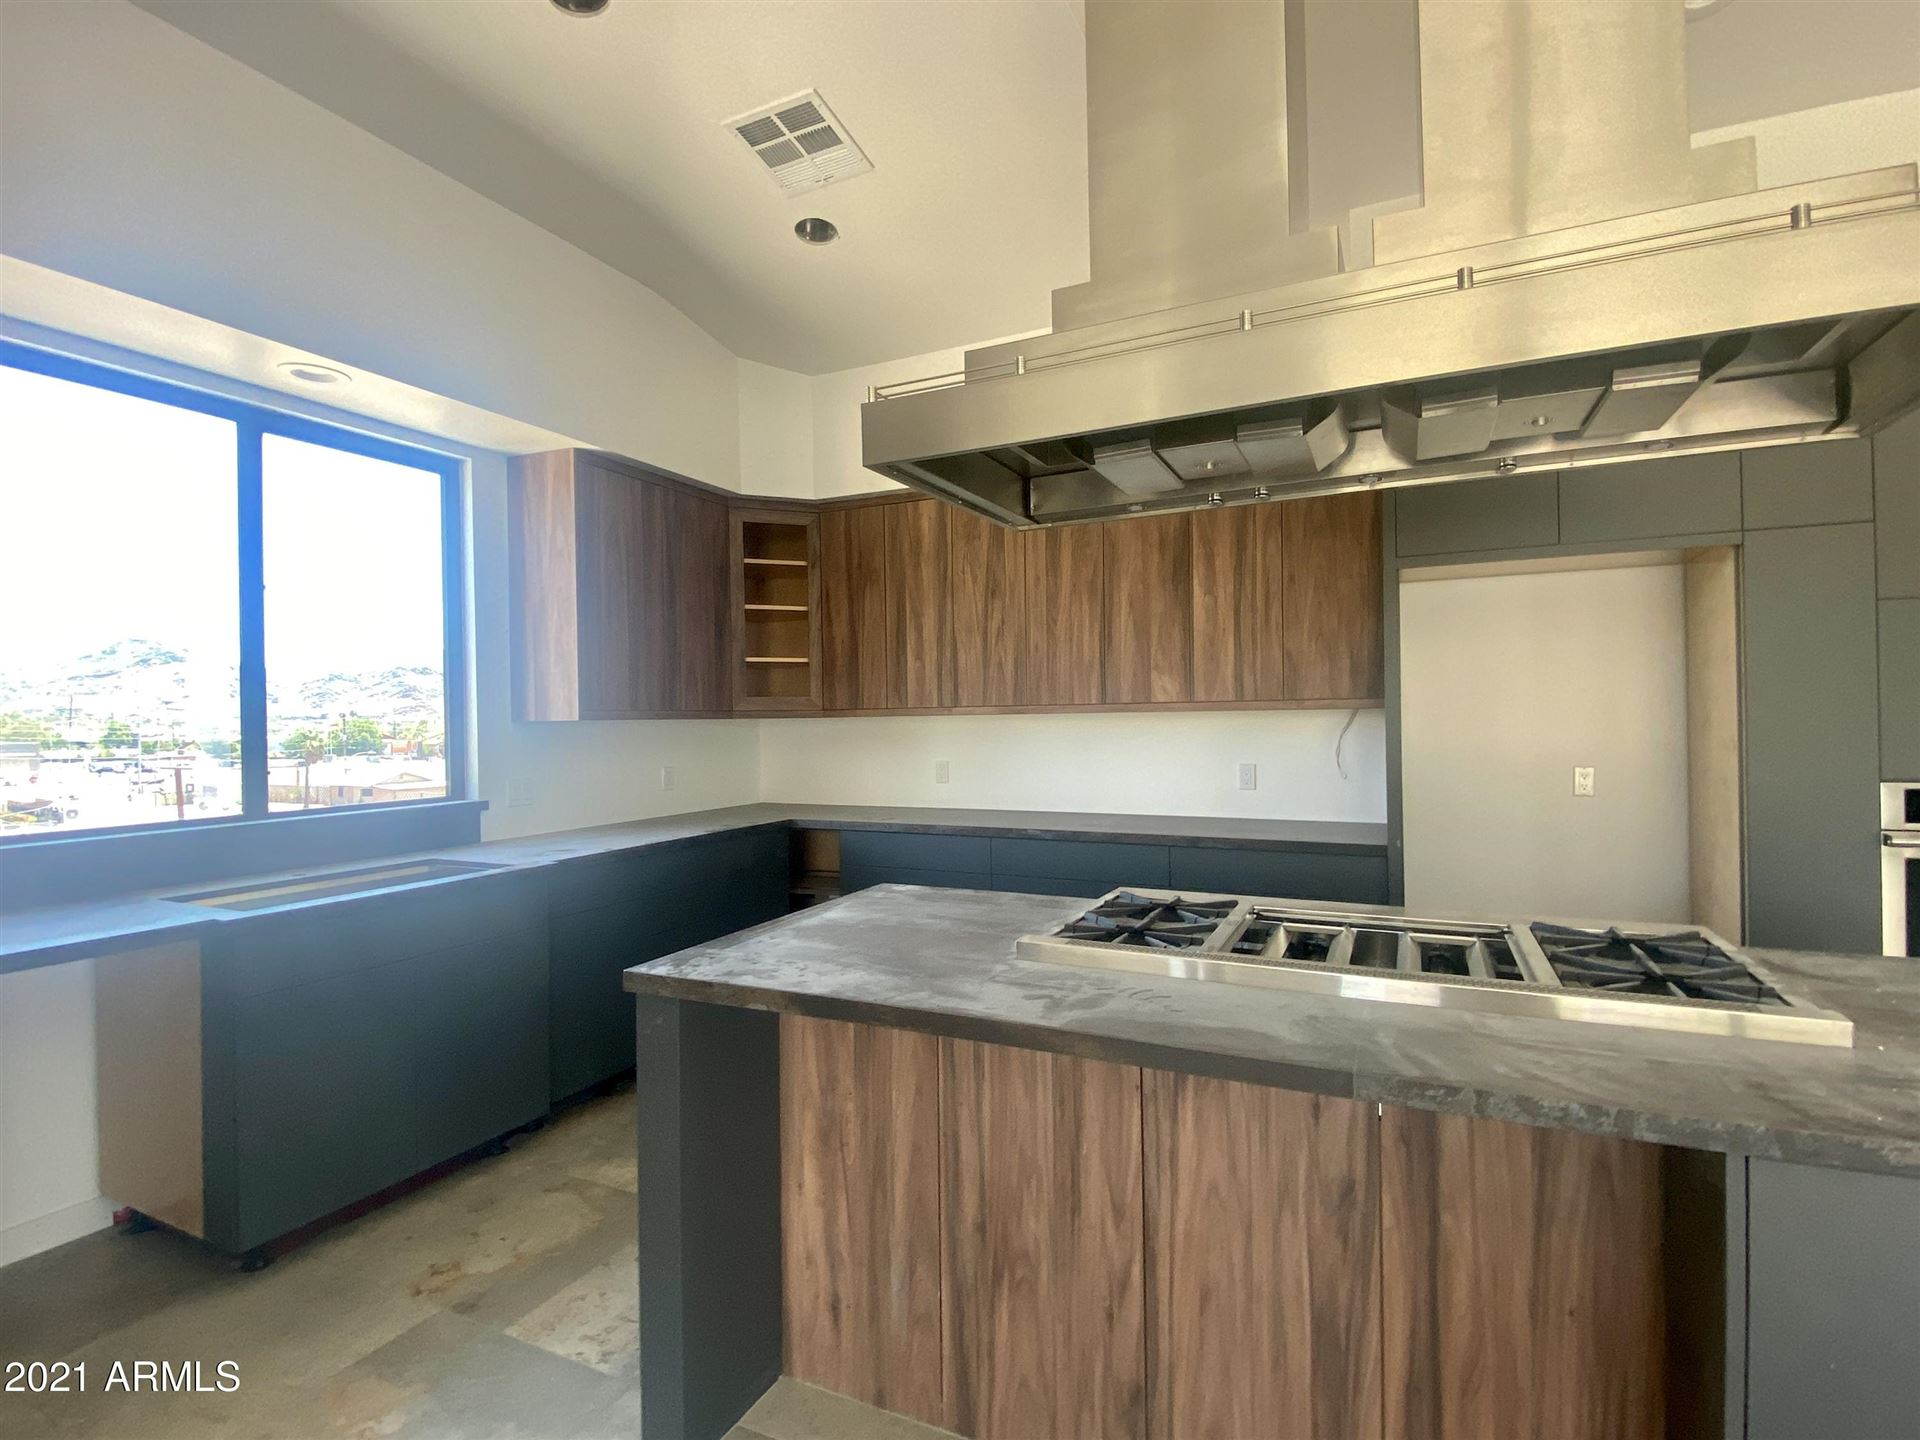 9721 N 5TH Street, Phoenix, AZ 85020 - MLS#: 6204502